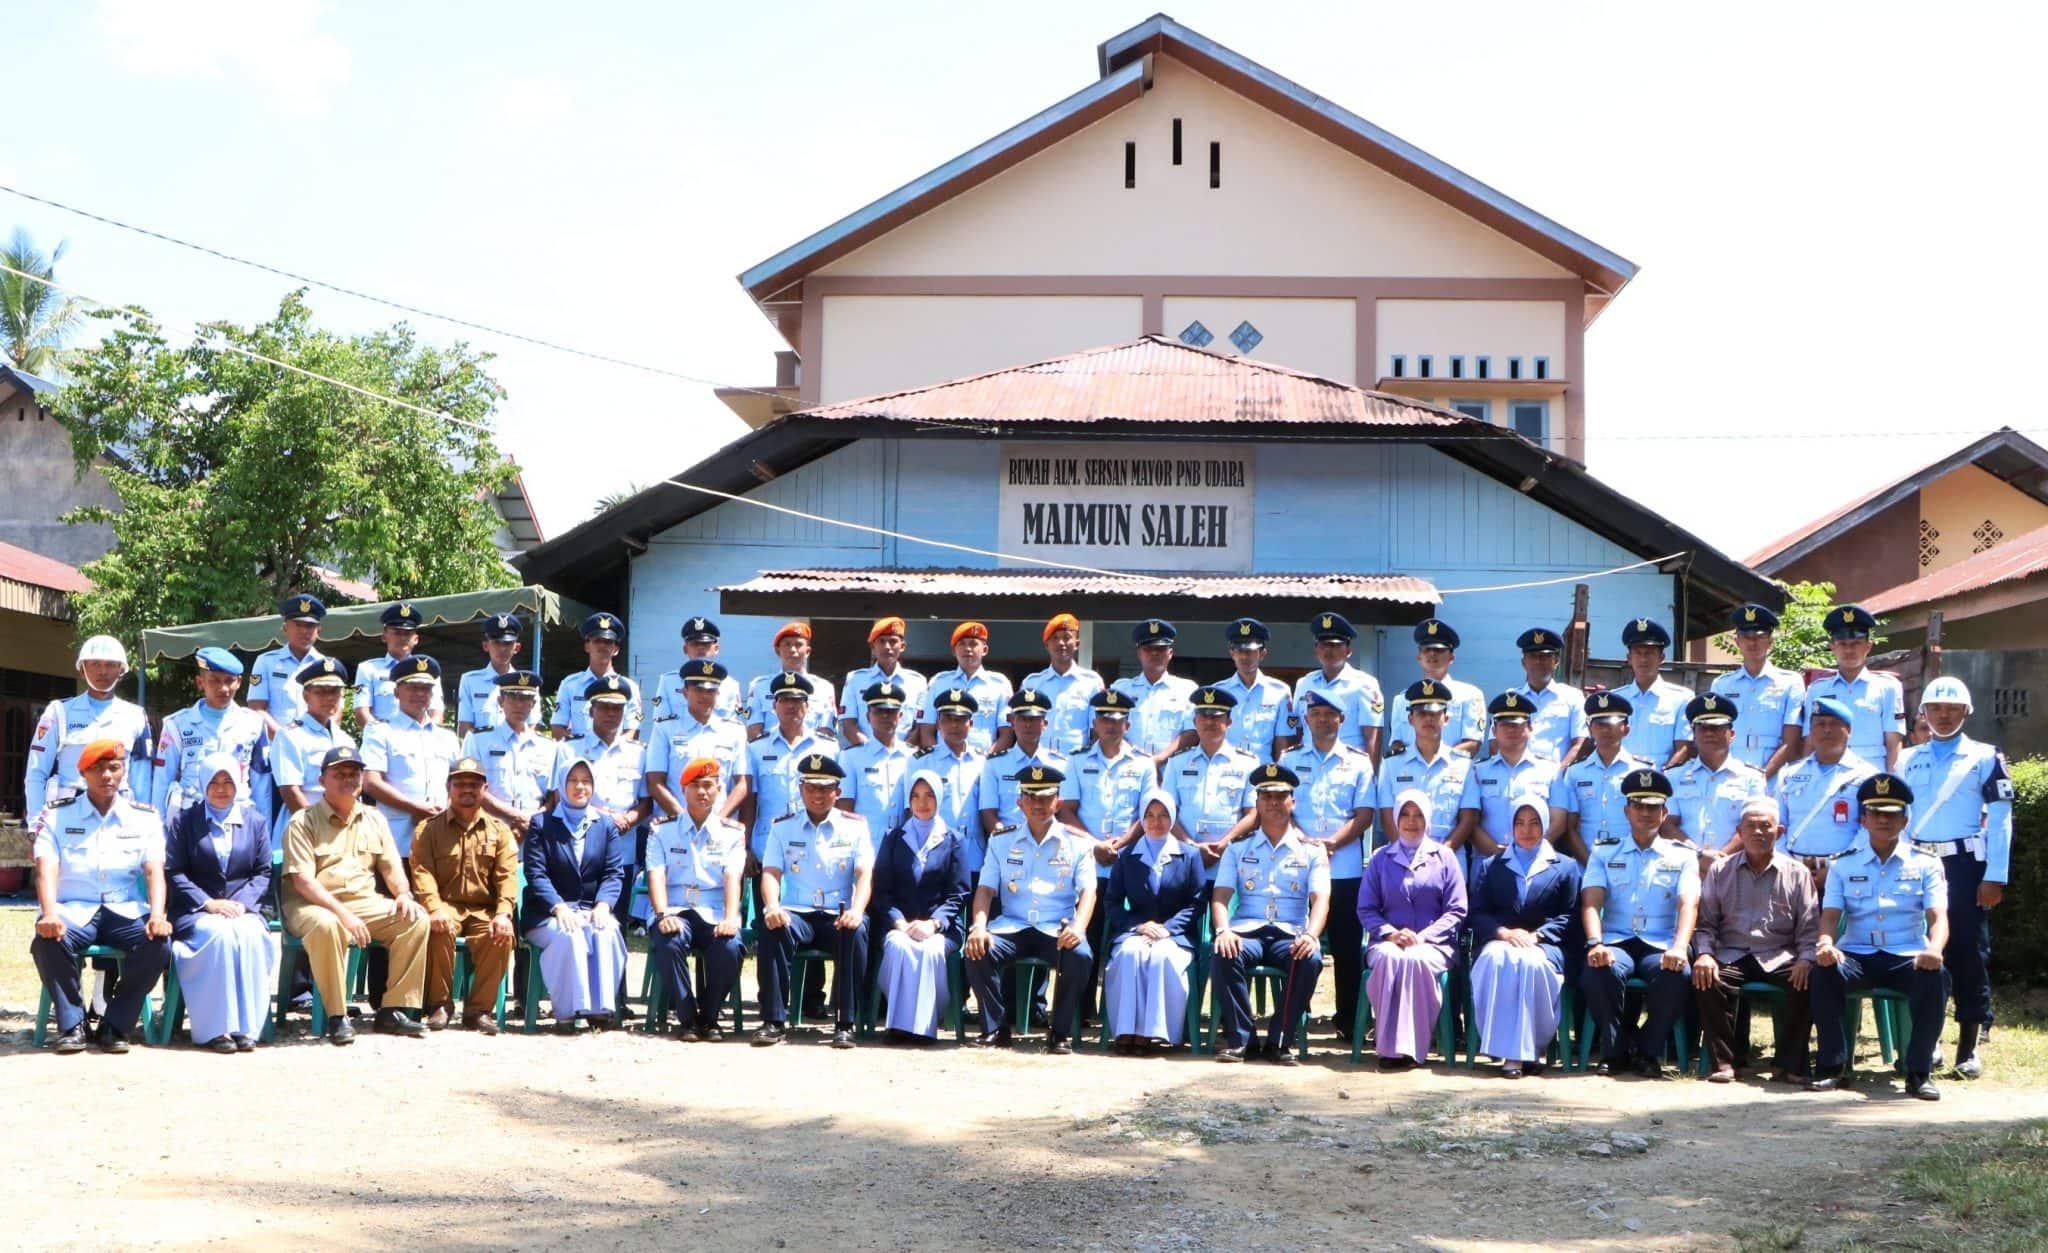 TNI AU Se-Aceh Ziarah Rombongan Di Makam Pahlawan